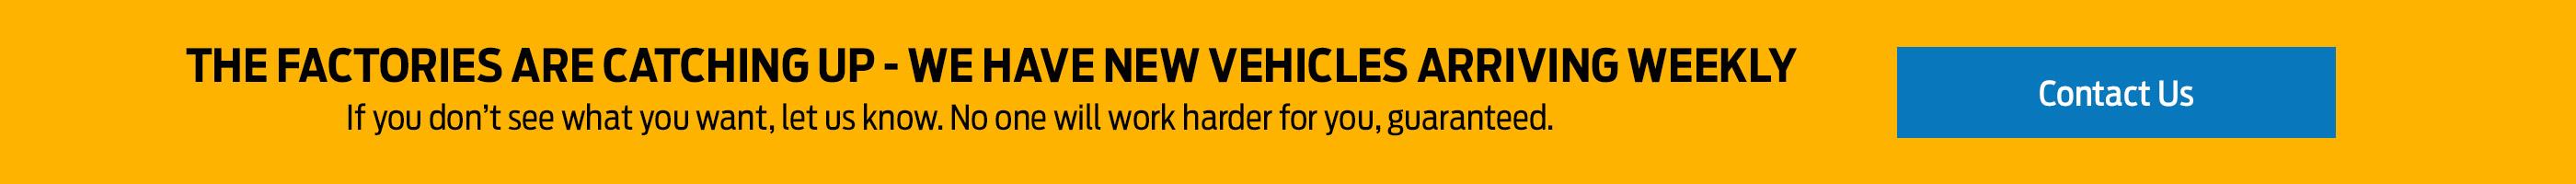 Vehicle Locator